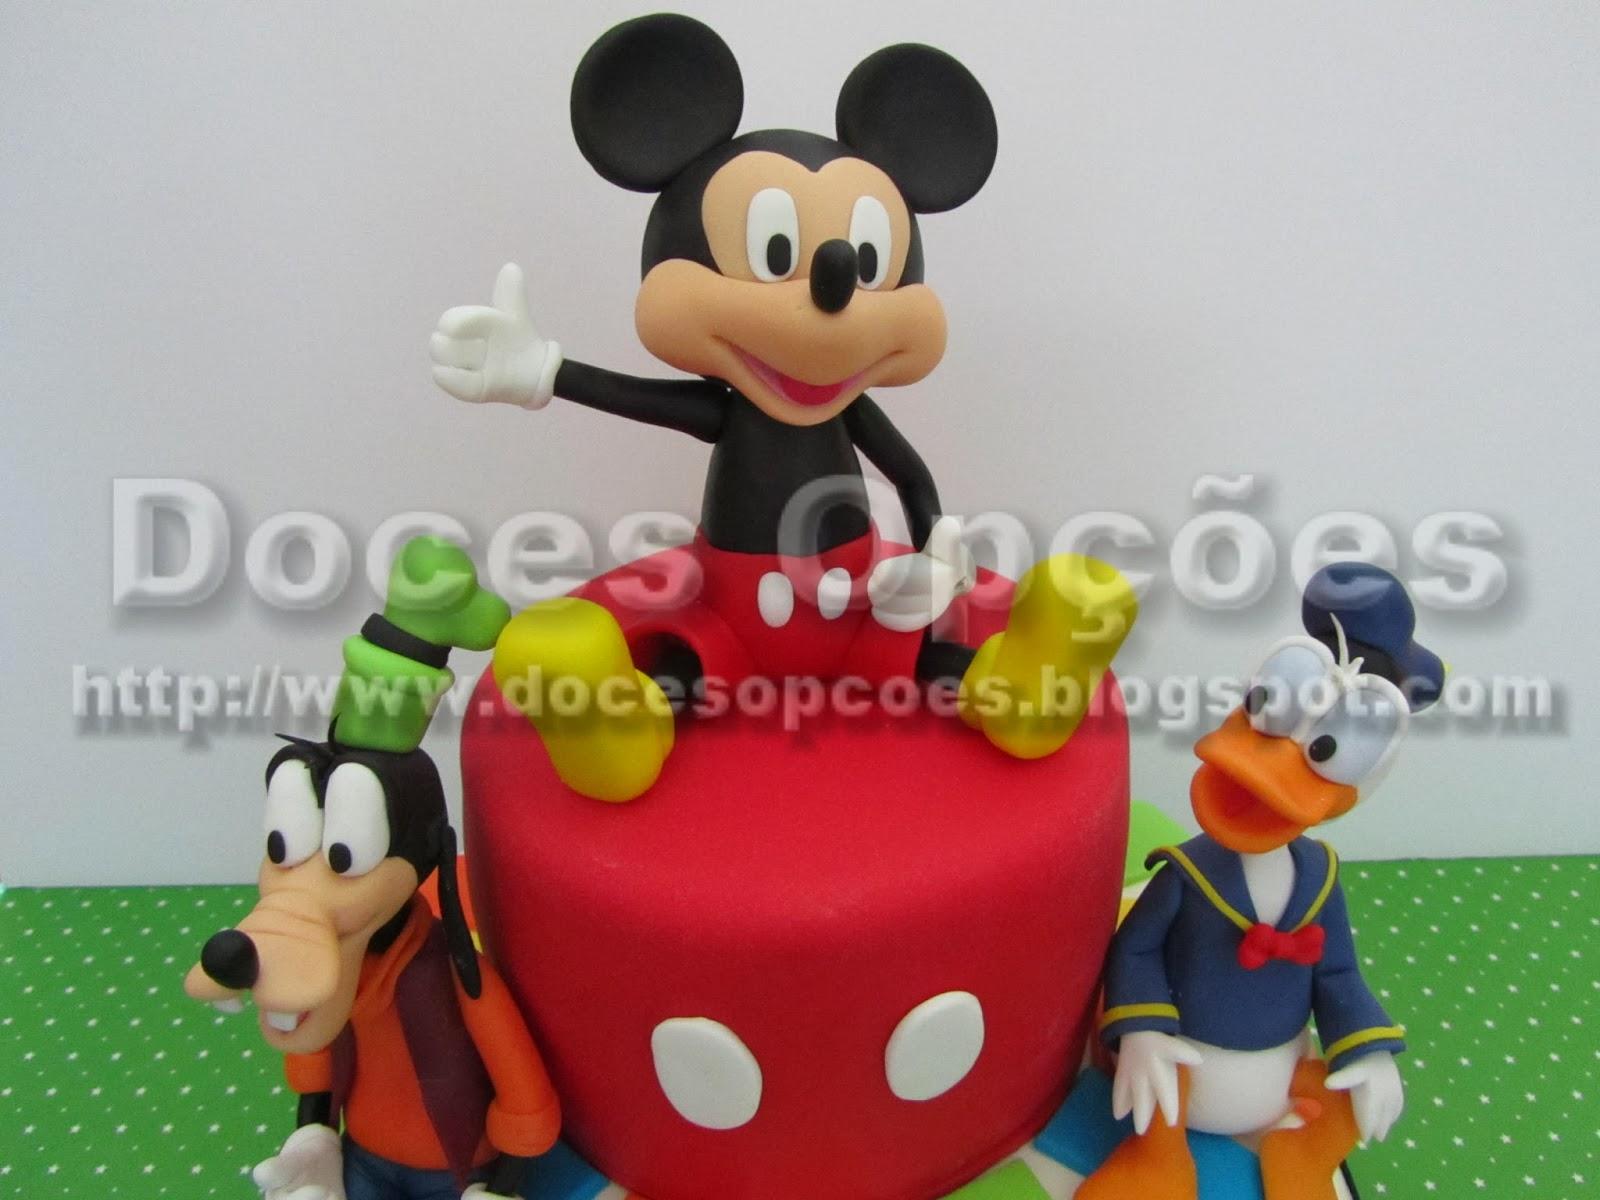 bolos decorados aniversário mickey e amigos